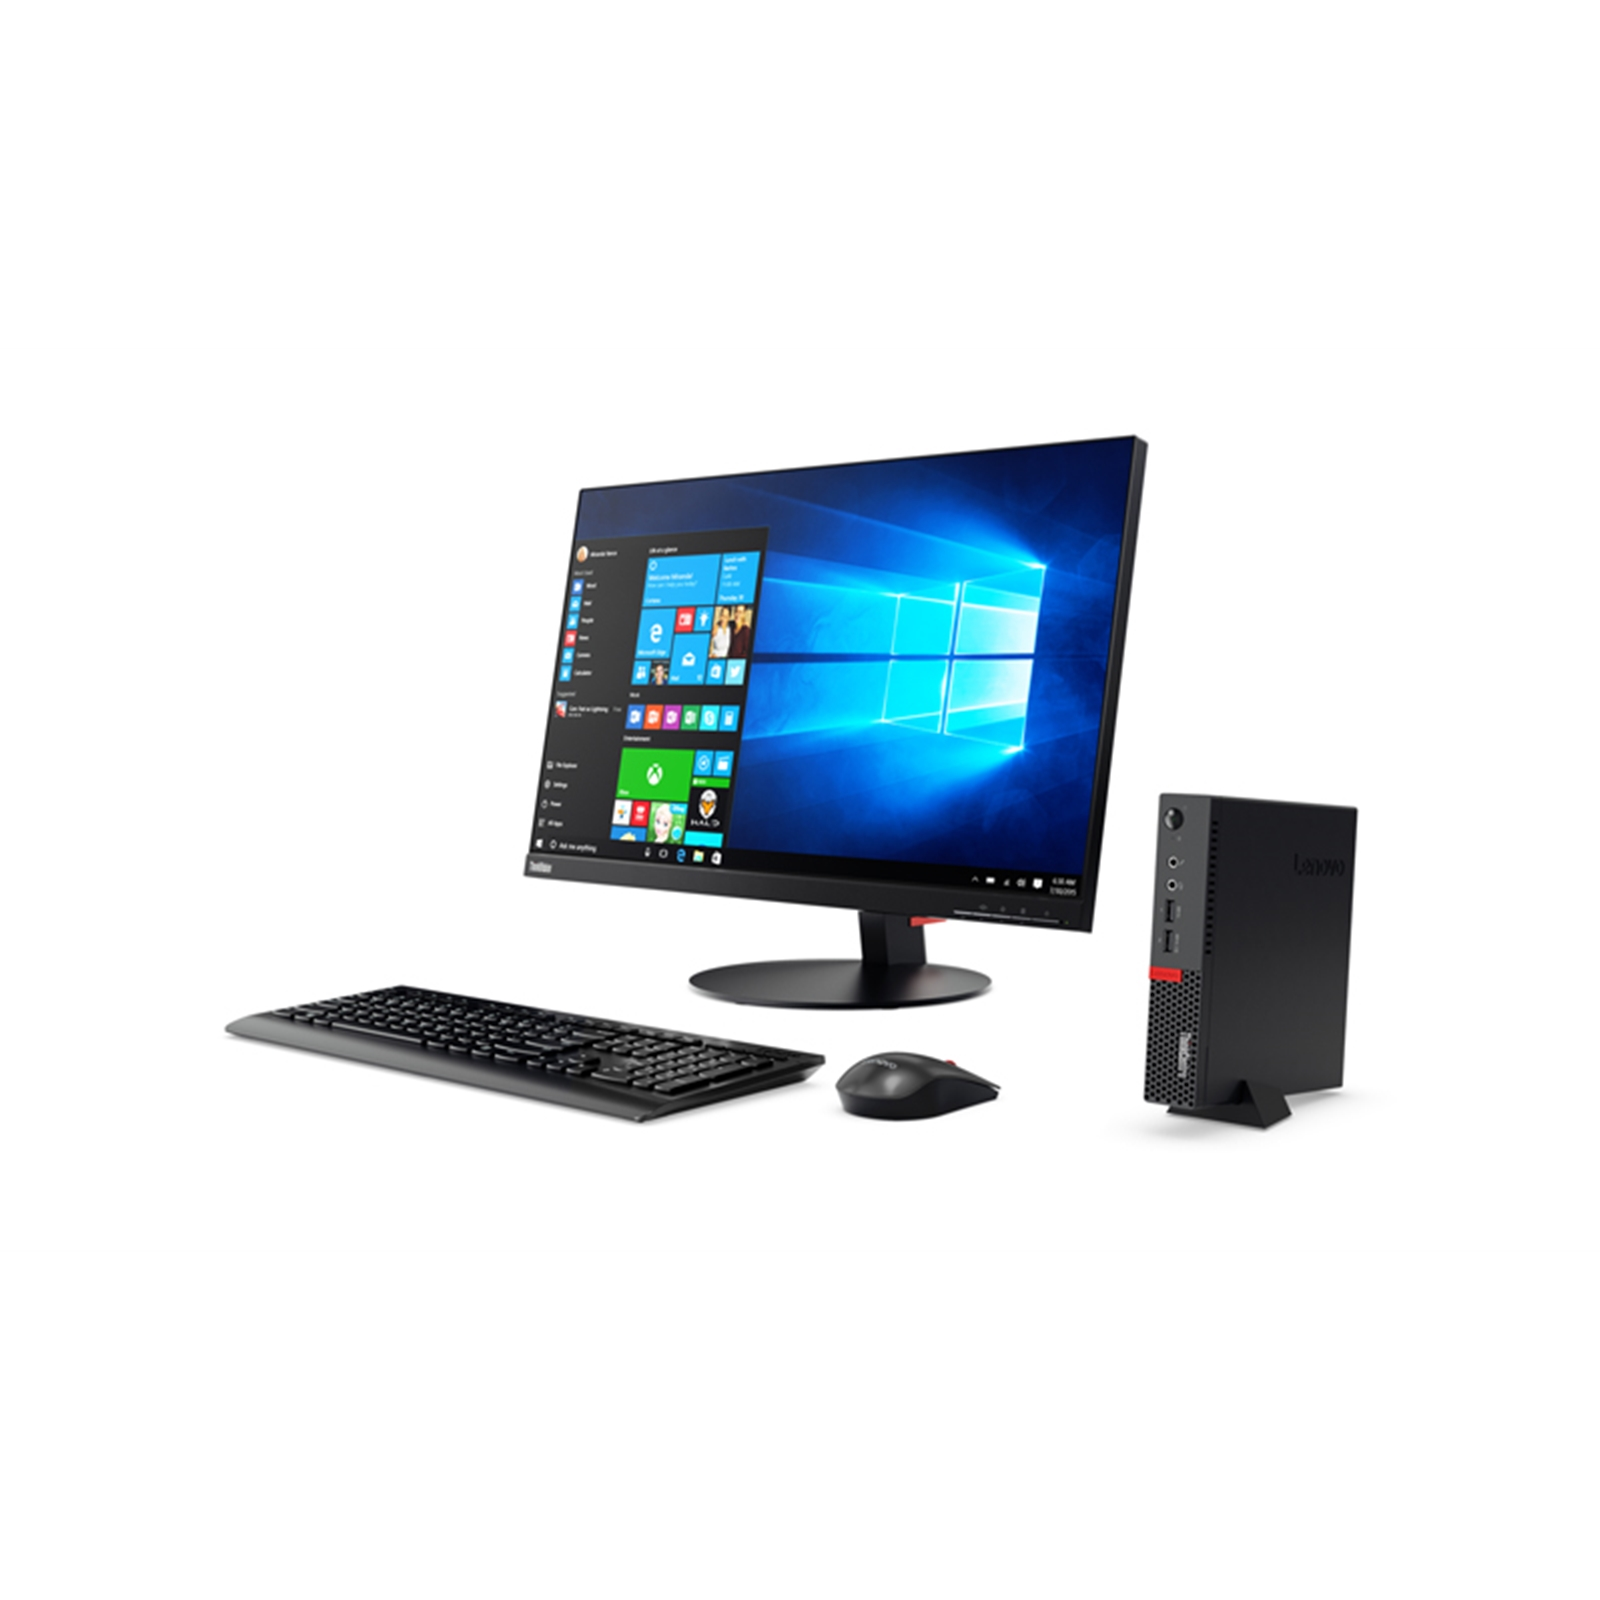 Lenovo Desktops 10mr0021uk Servers Plus